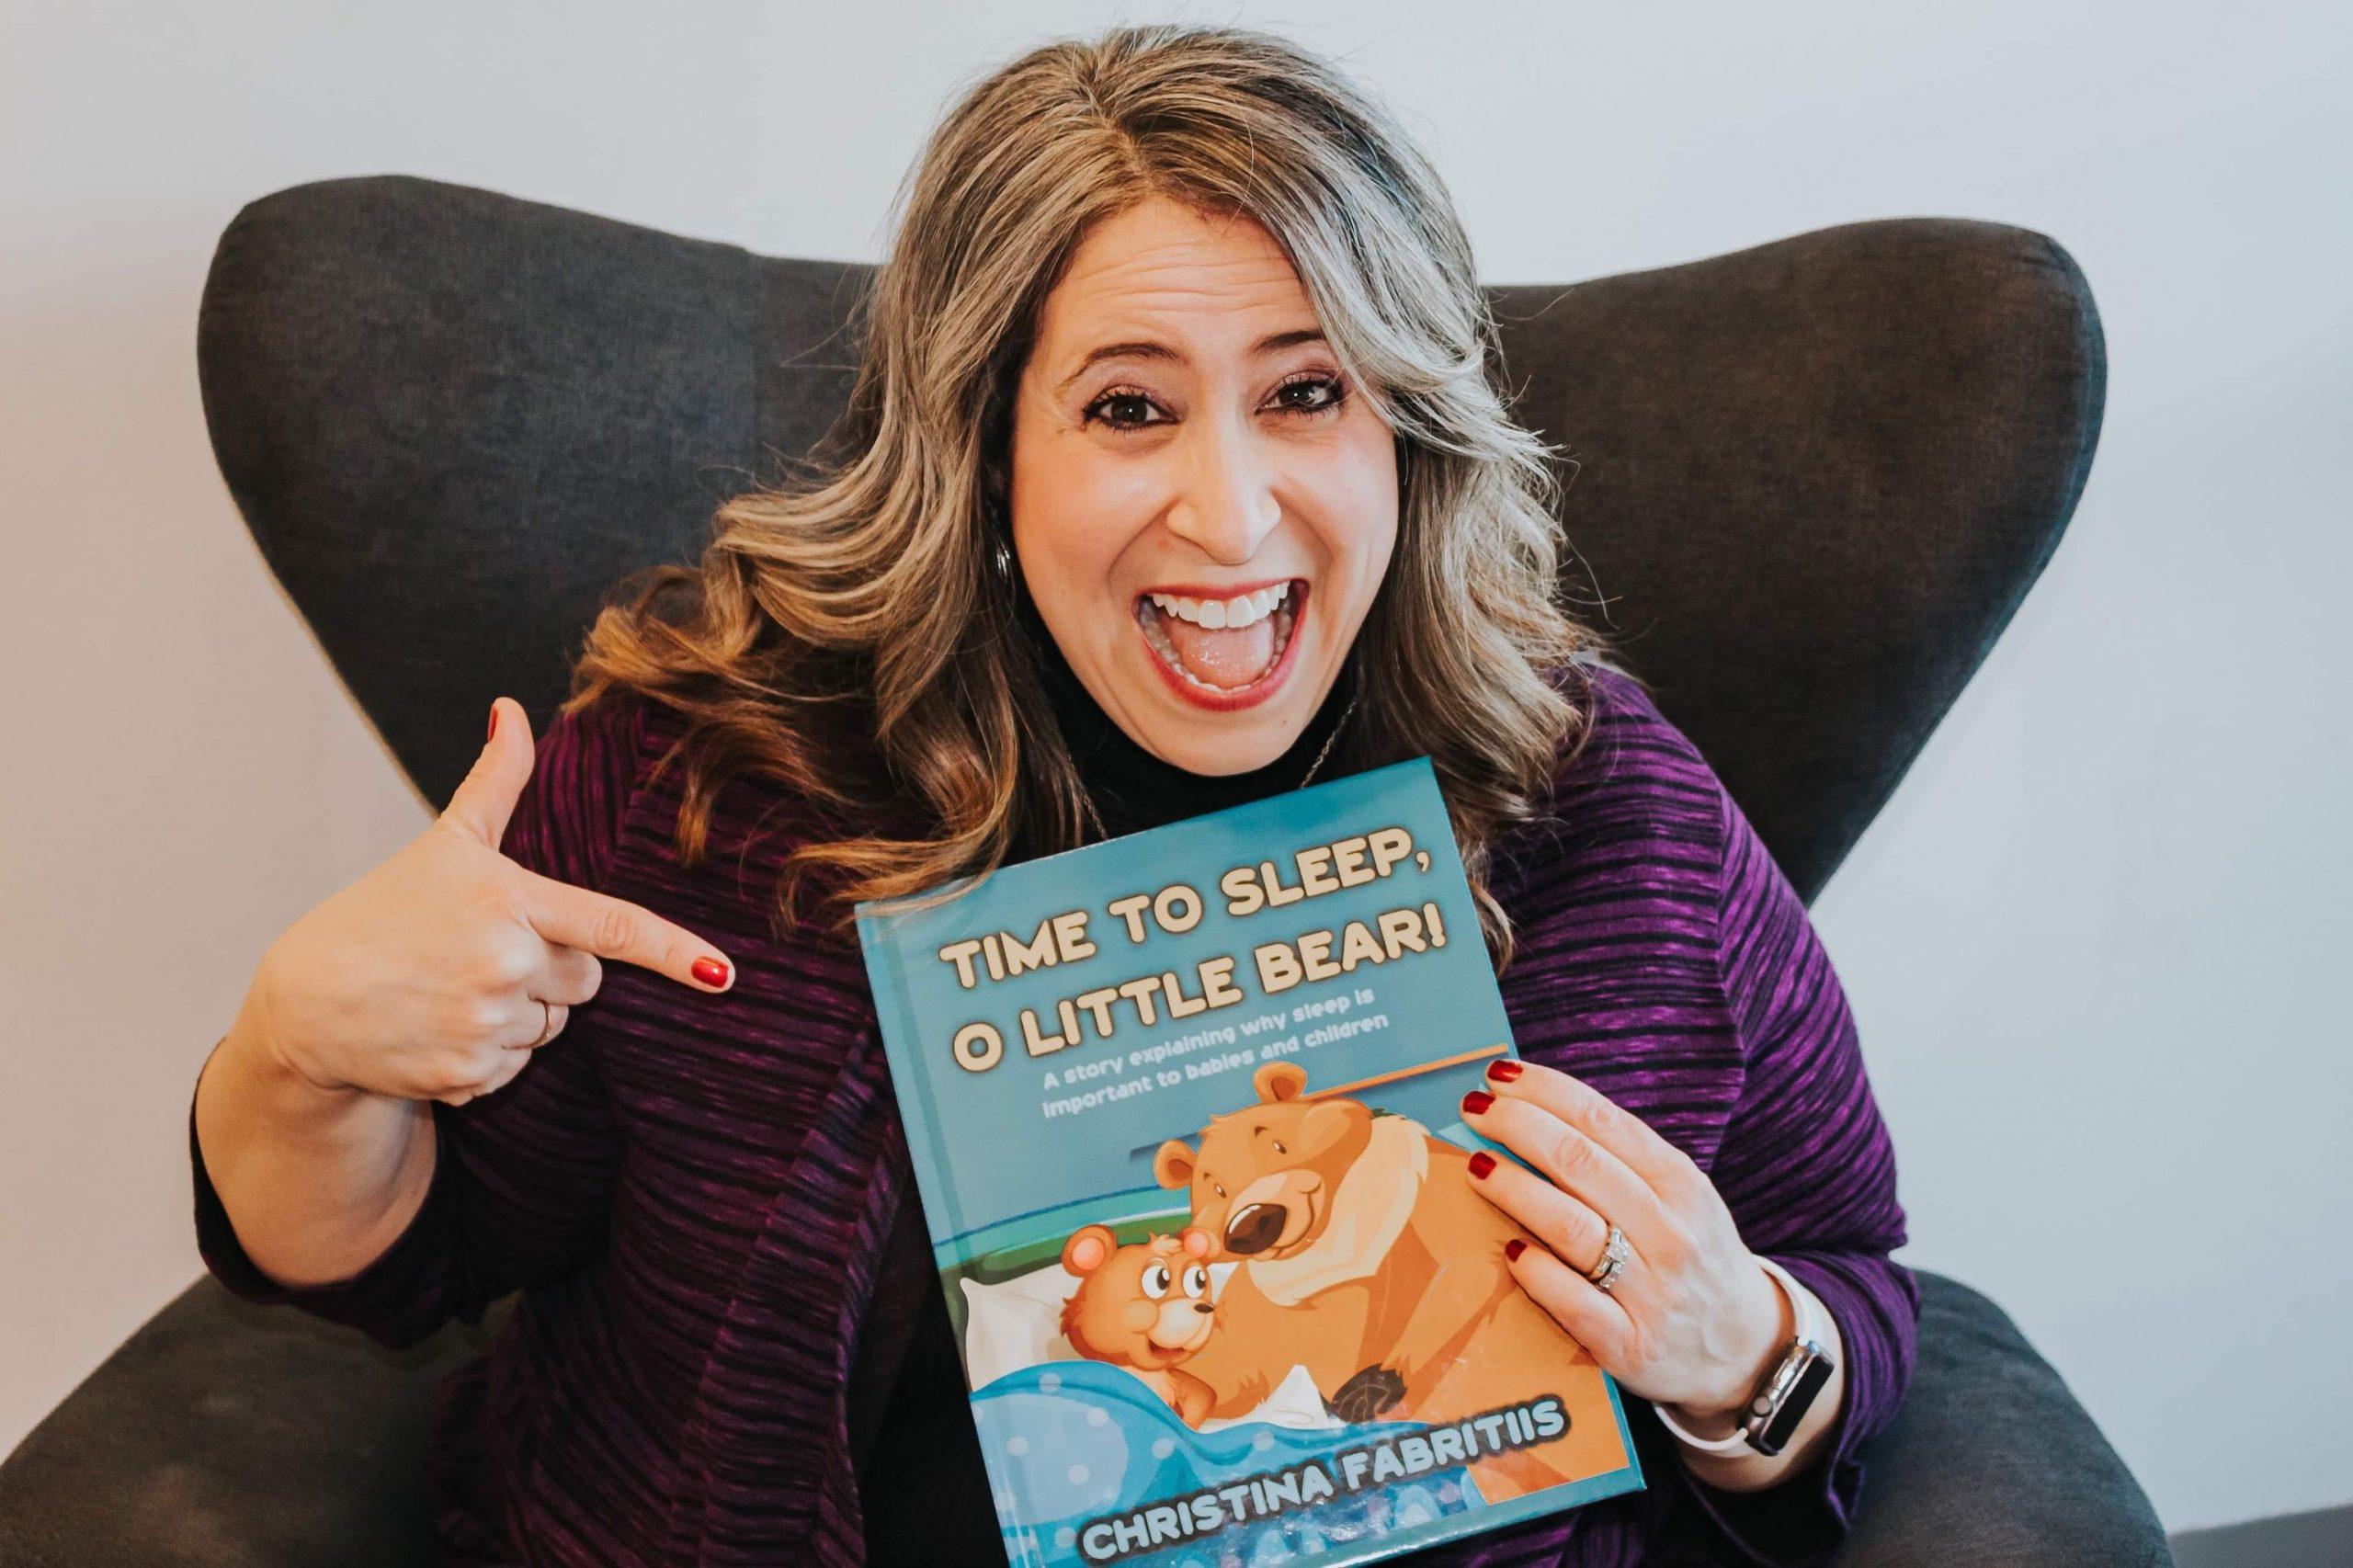 Time to Sleep O Little Bear by Christina Fabritiis | Sleep Solutions Book